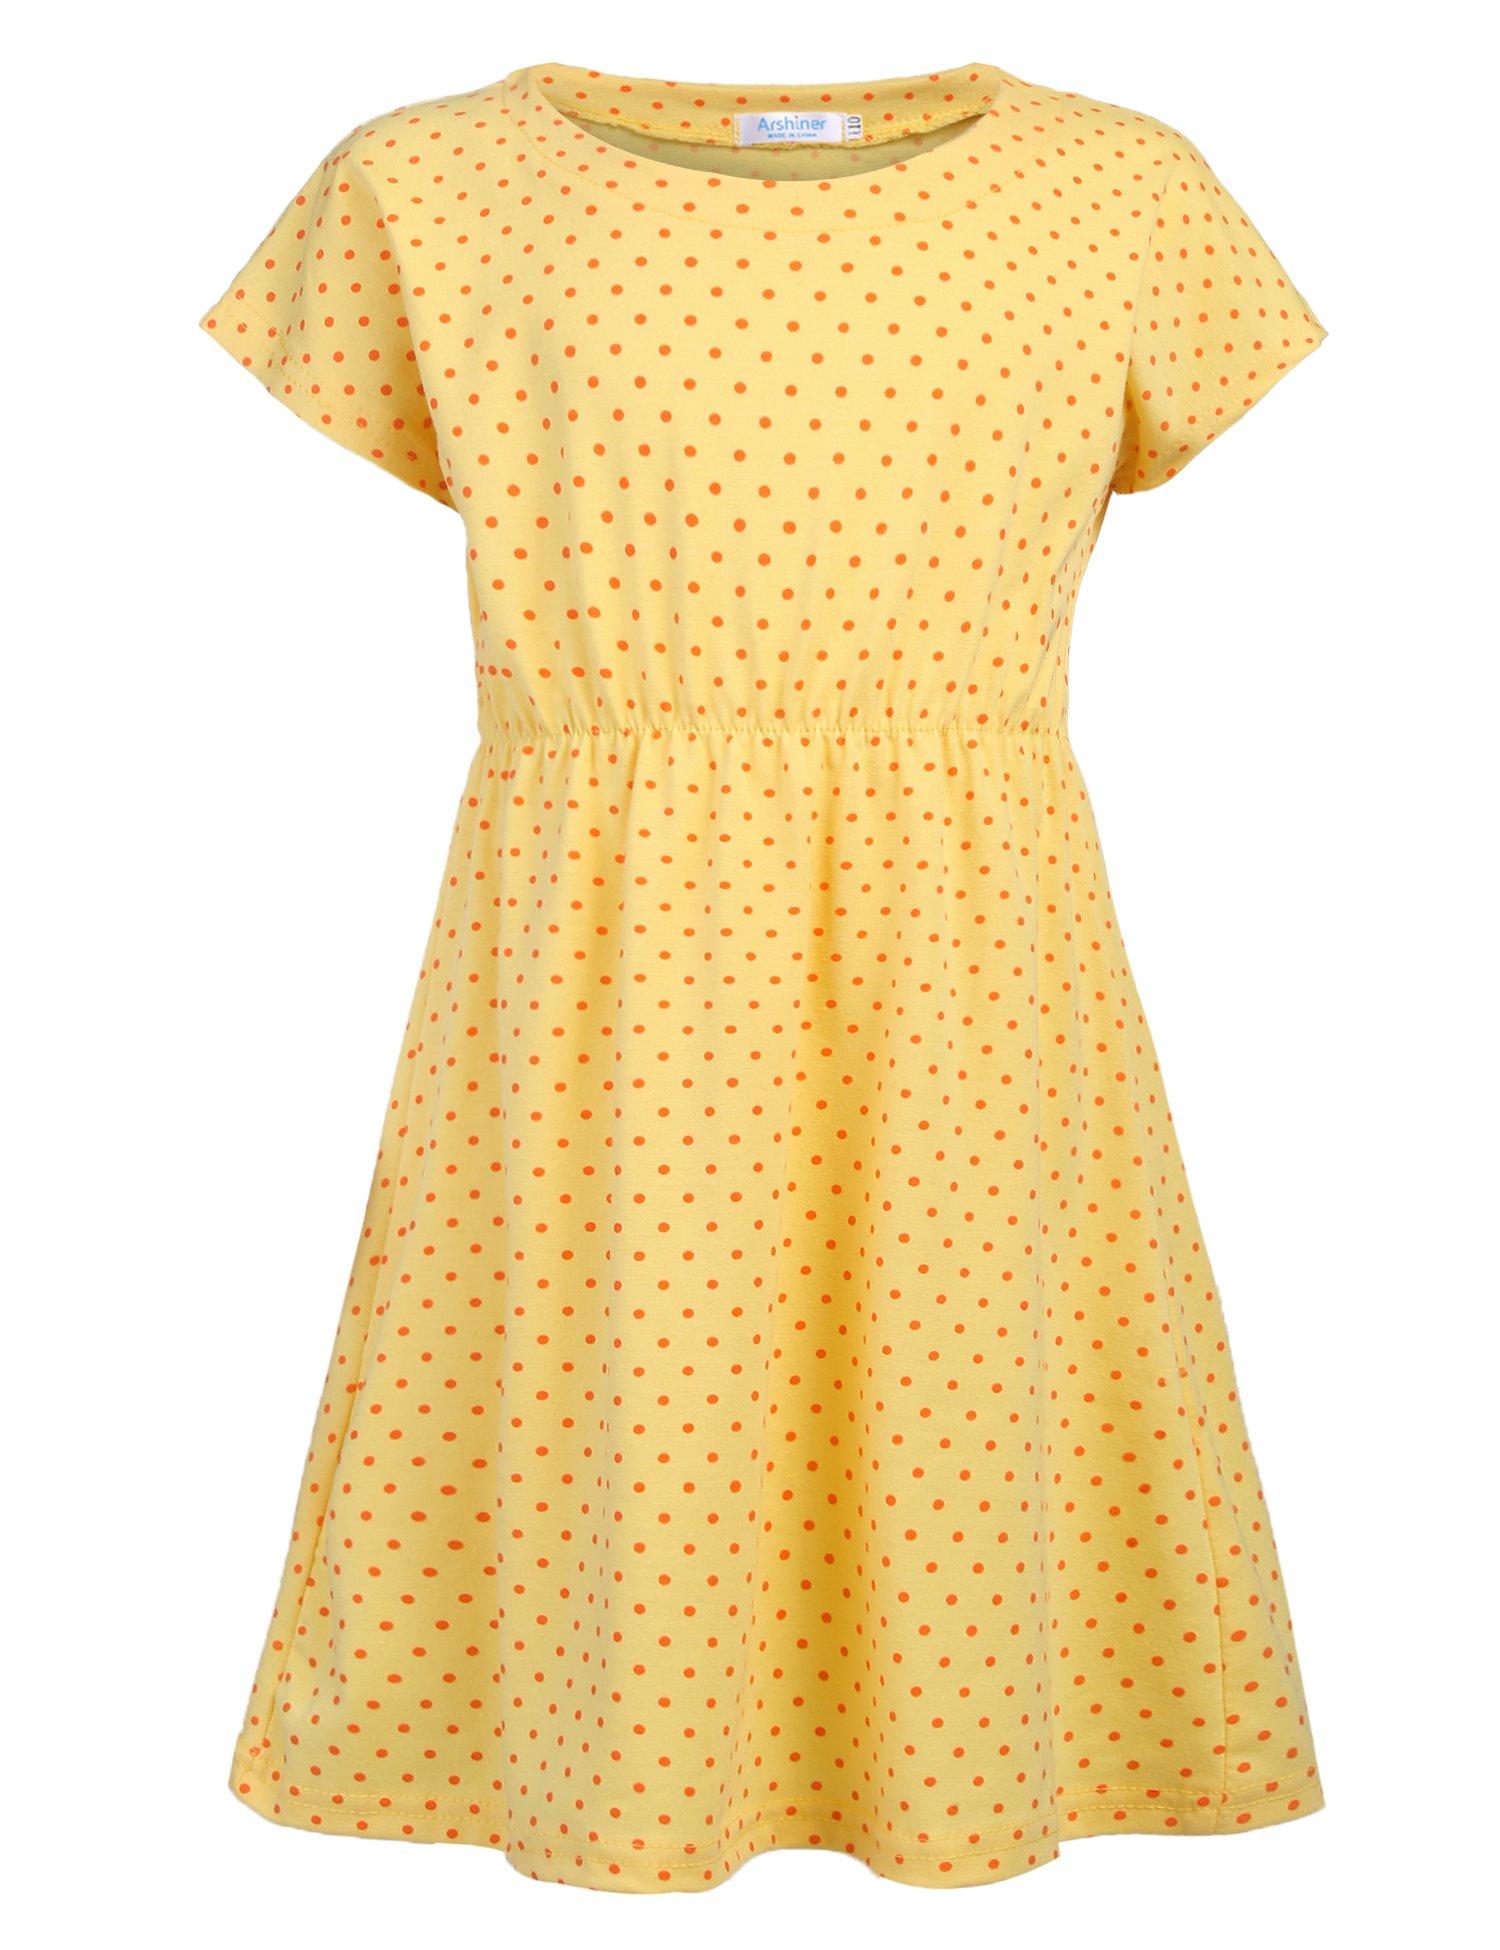 Arshiner Kids Girls Dress Small Polka Dots Summer Short Sleeve Casual Style Size 3-10